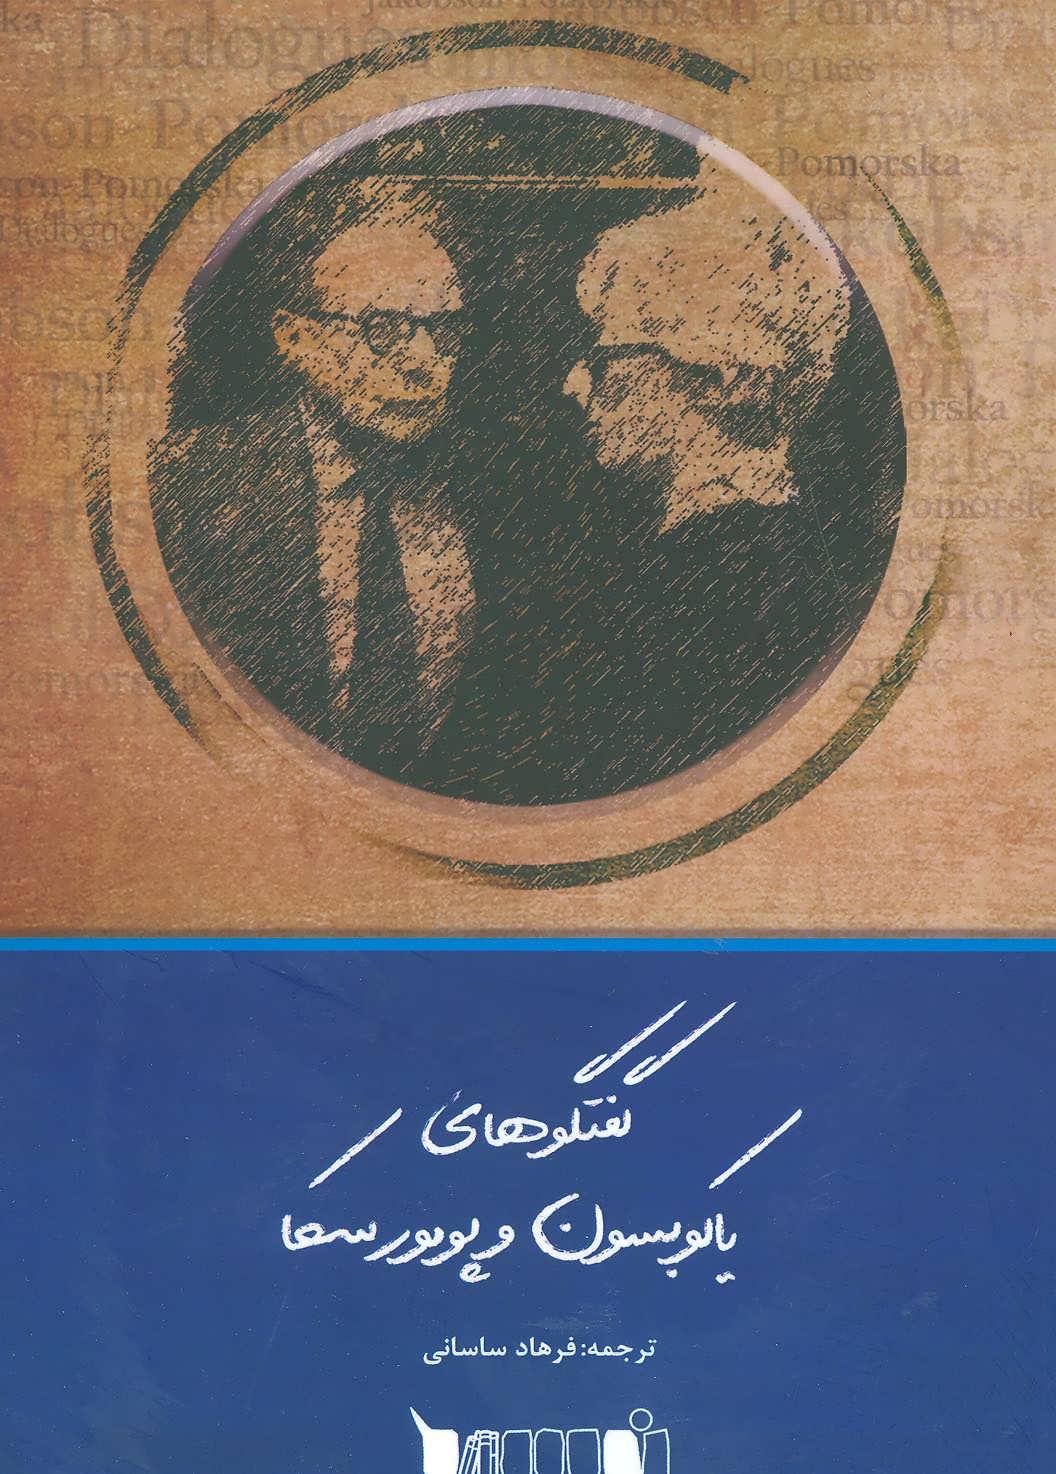 کتاب گفتگوهای یاکوبسون و پومورسکا